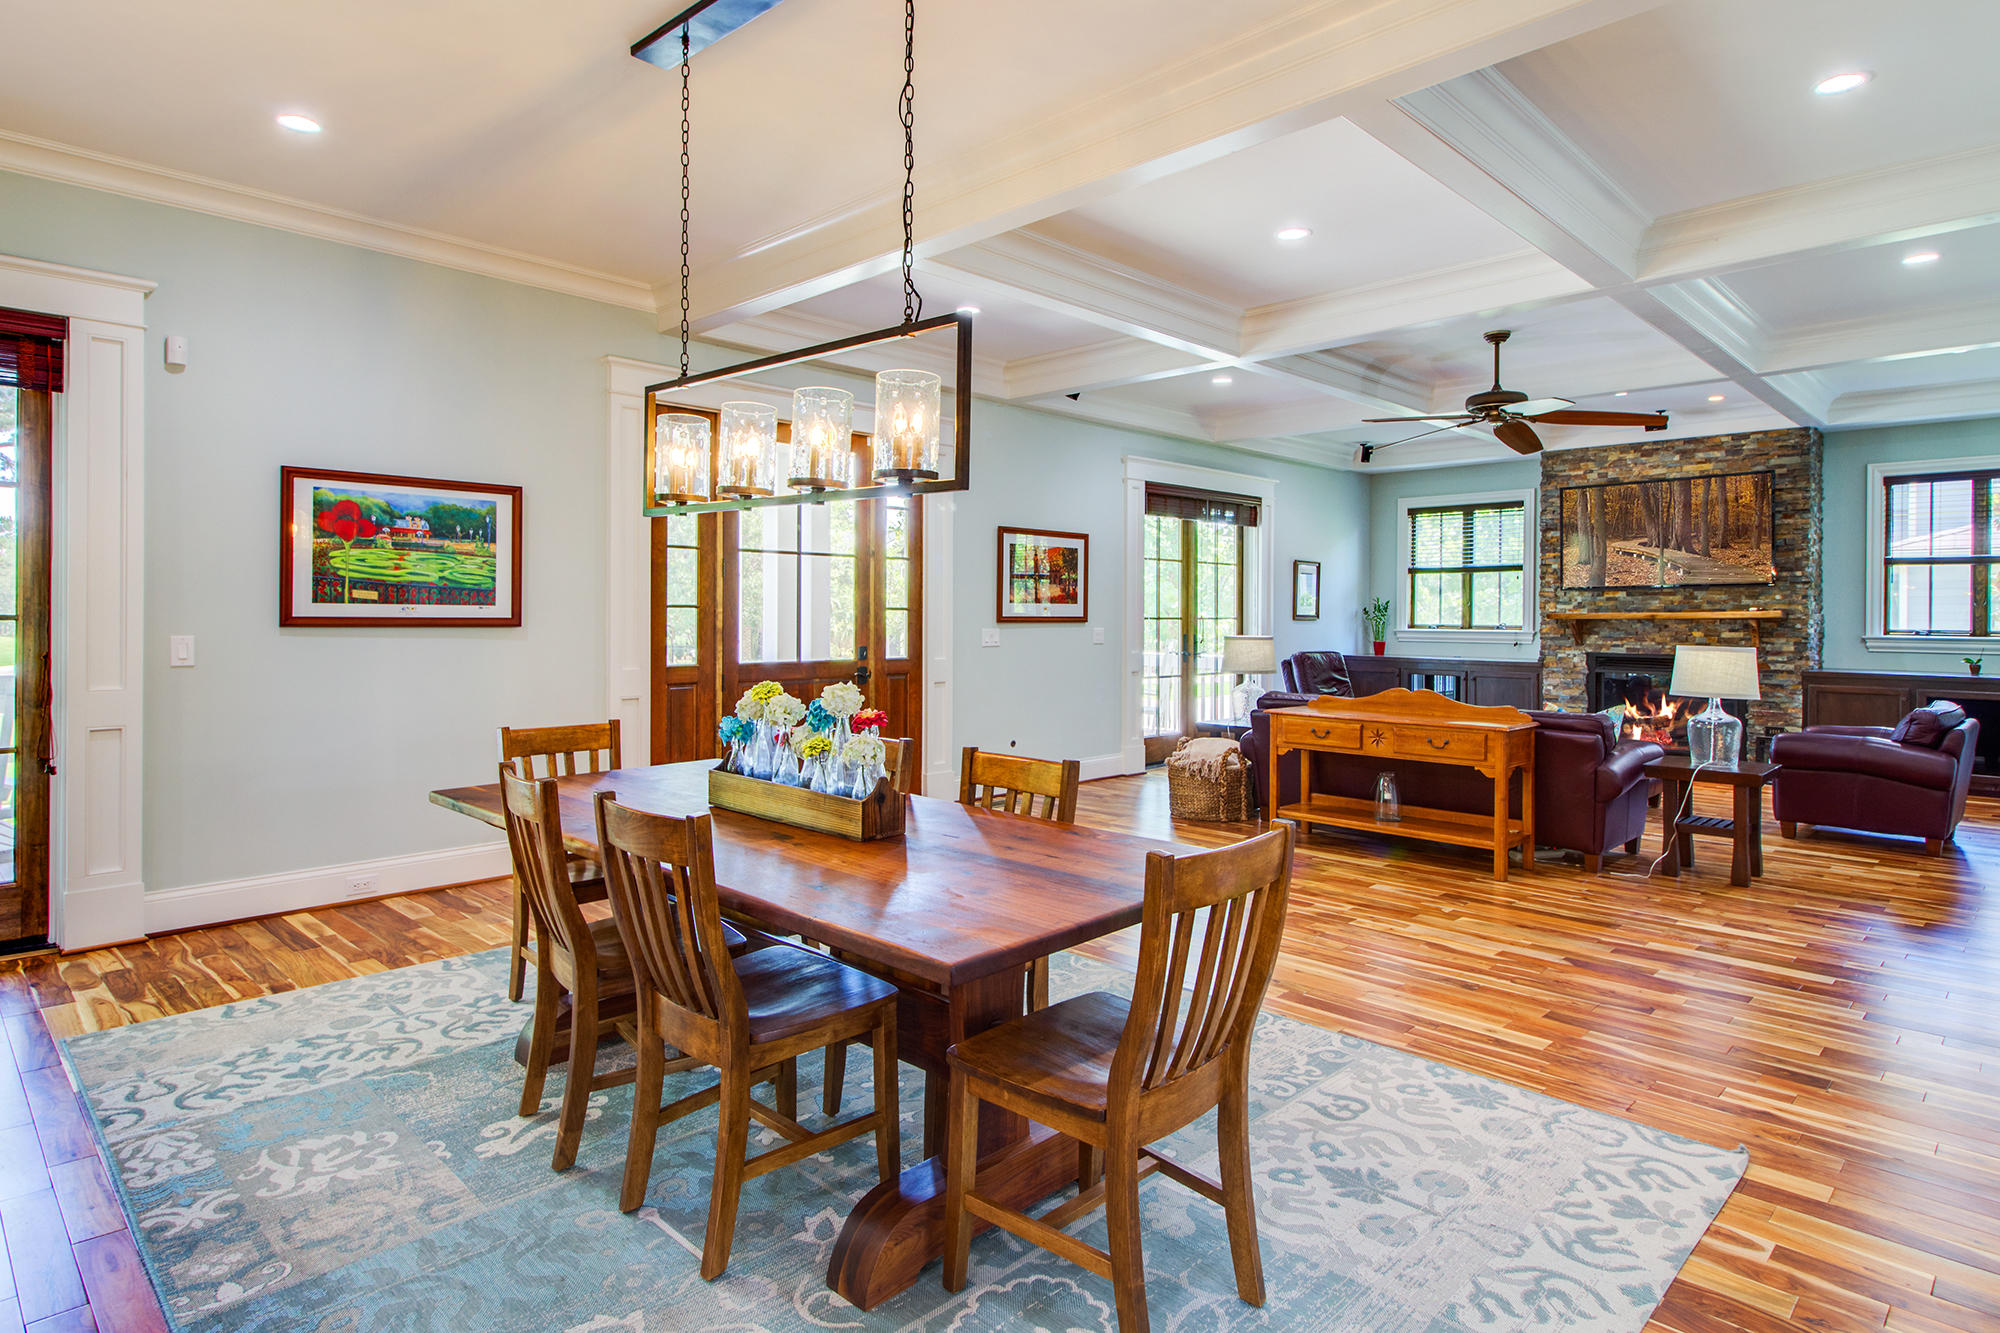 Daniel Island Park Homes For Sale - 131 Island Park, Daniel Island, SC - 10